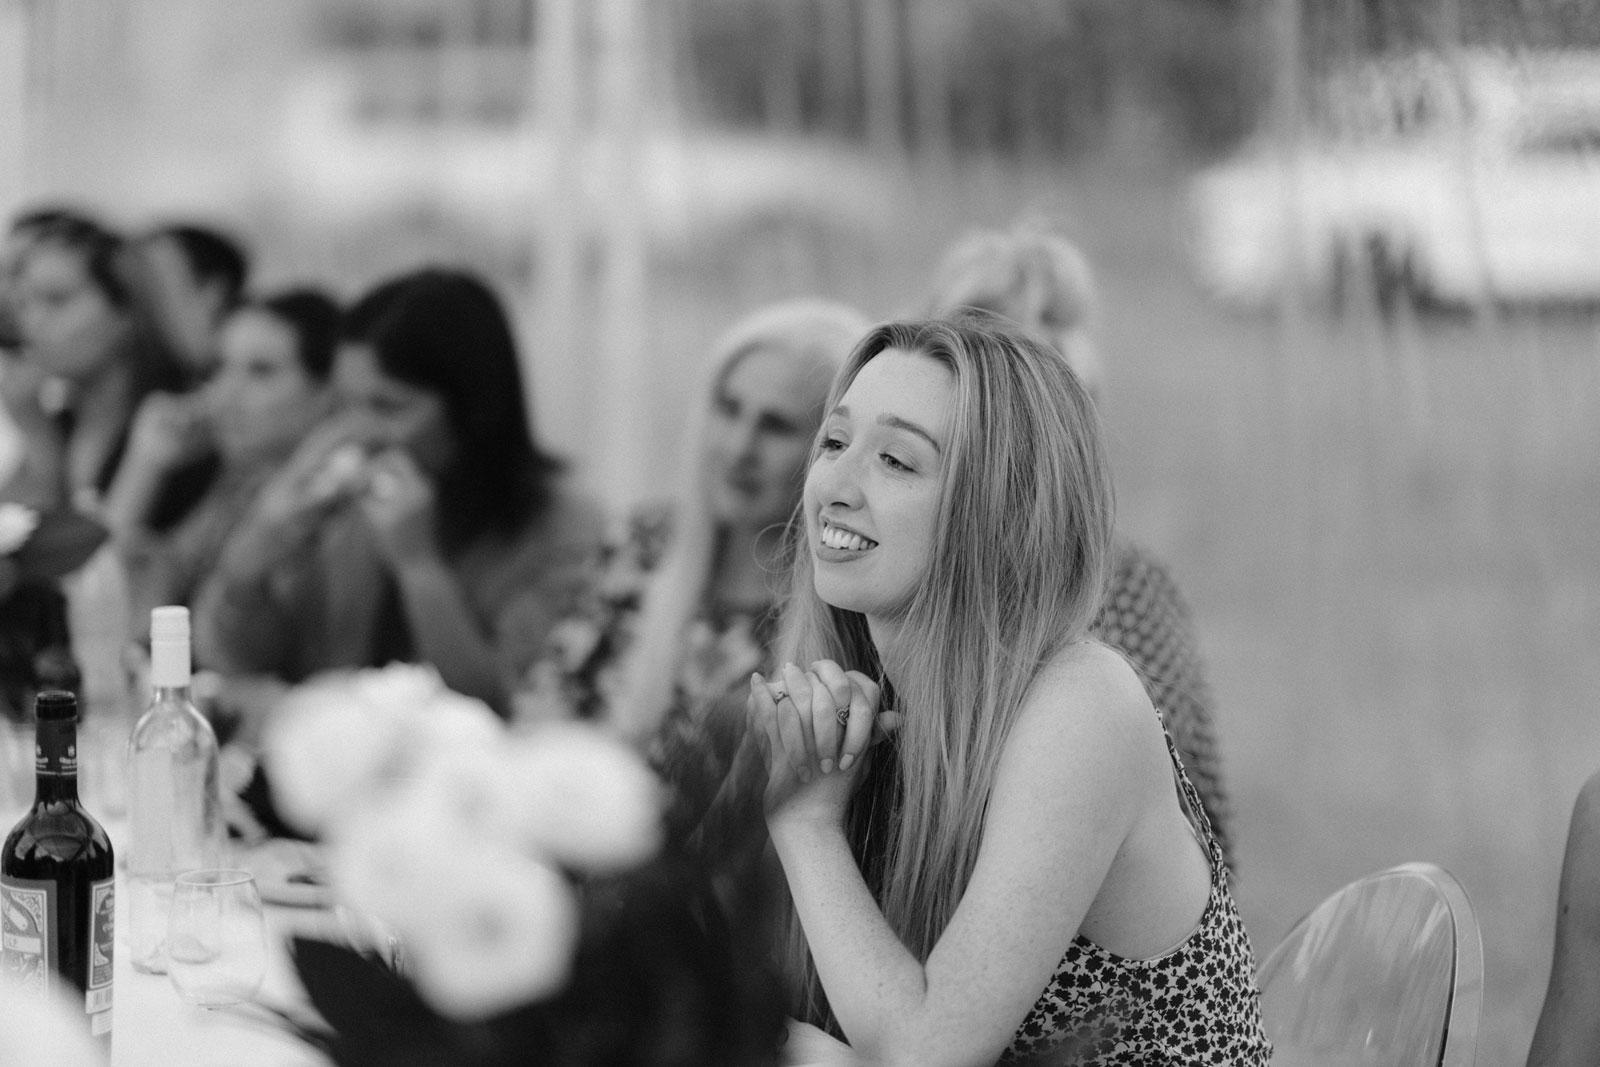 newfound-s-t-hunua-auckland-wedding-photographers-096